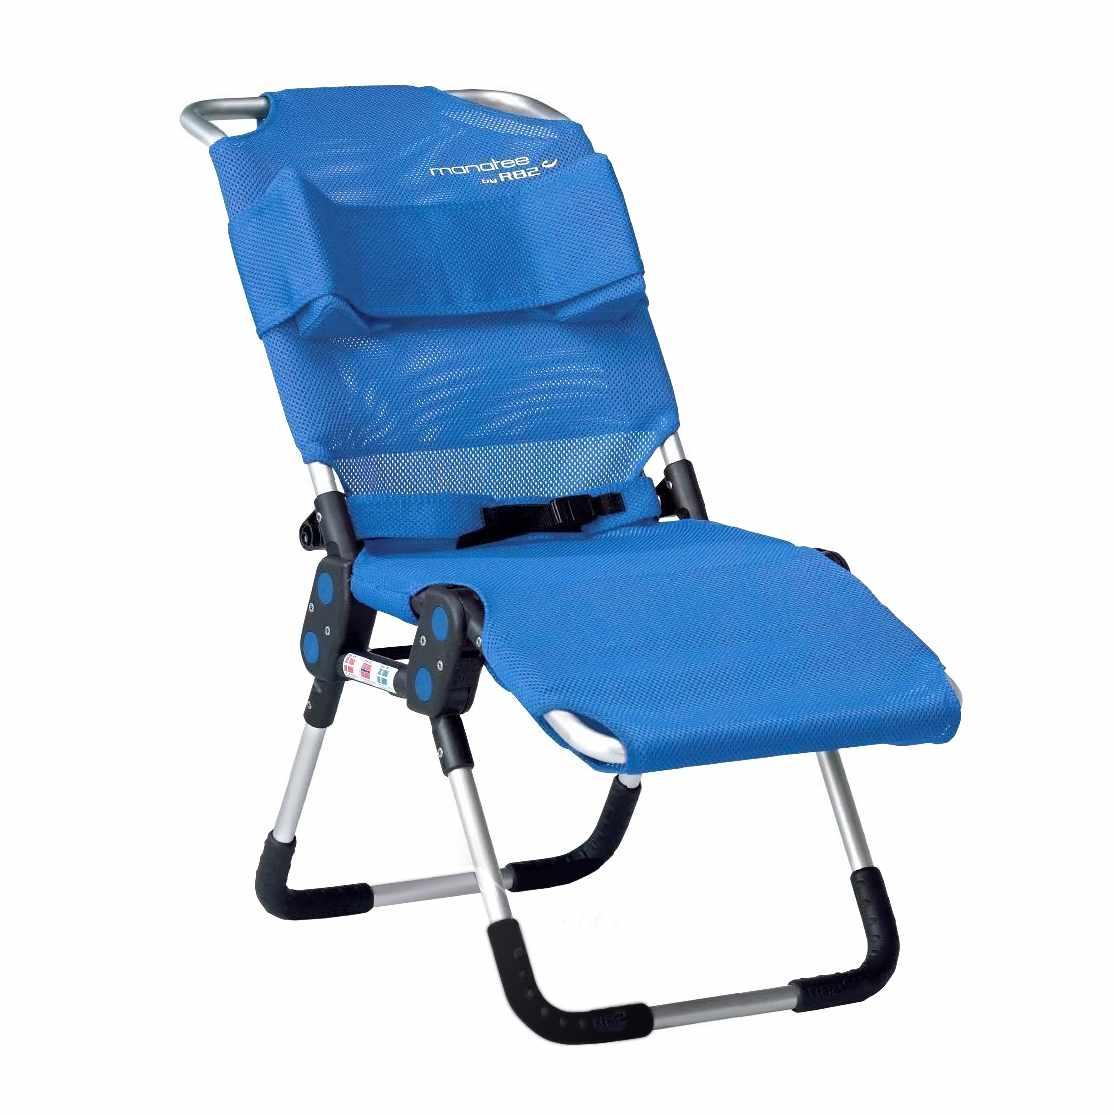 R82 Manatee bath seat